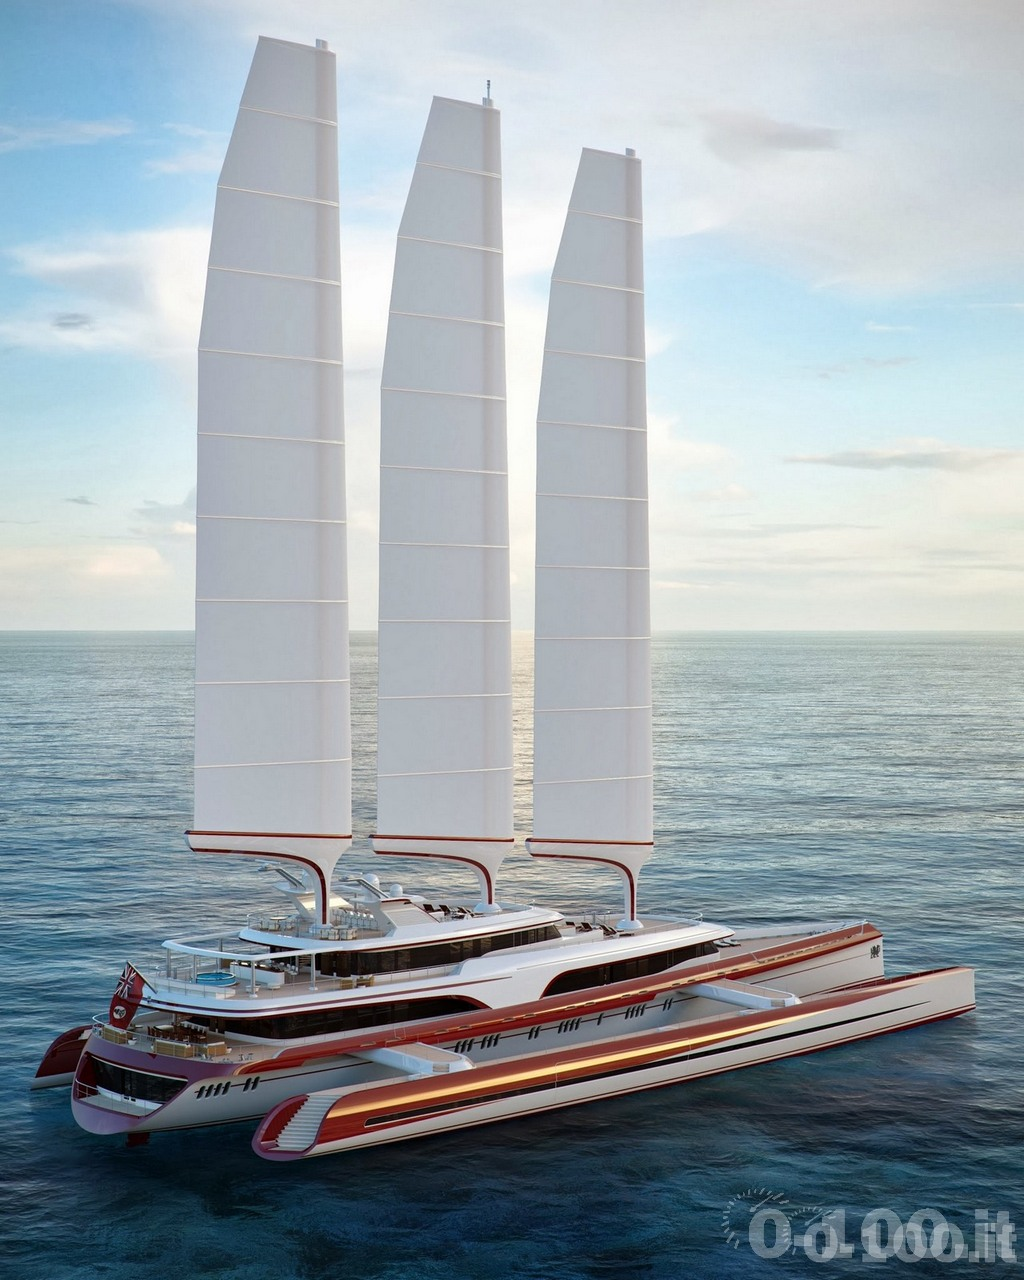 dragonship-80-trimaran-pi-yachts-mcpherson-yacht-design-0-100_7